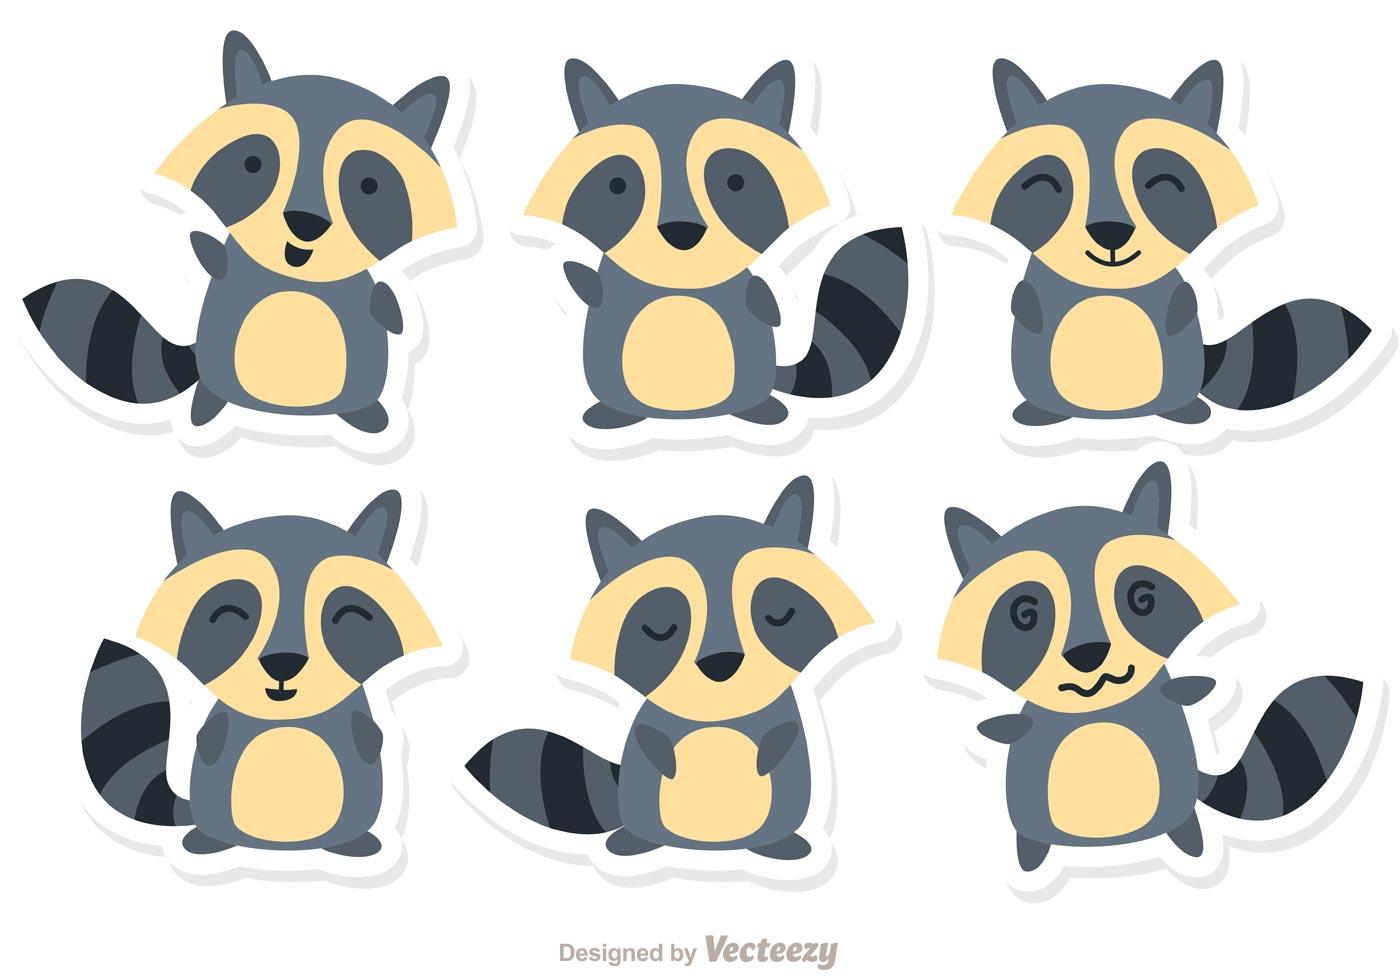 Vector Cartoon For Free Download About 5 514 Vector: Cartoon Raccoon Set Vector